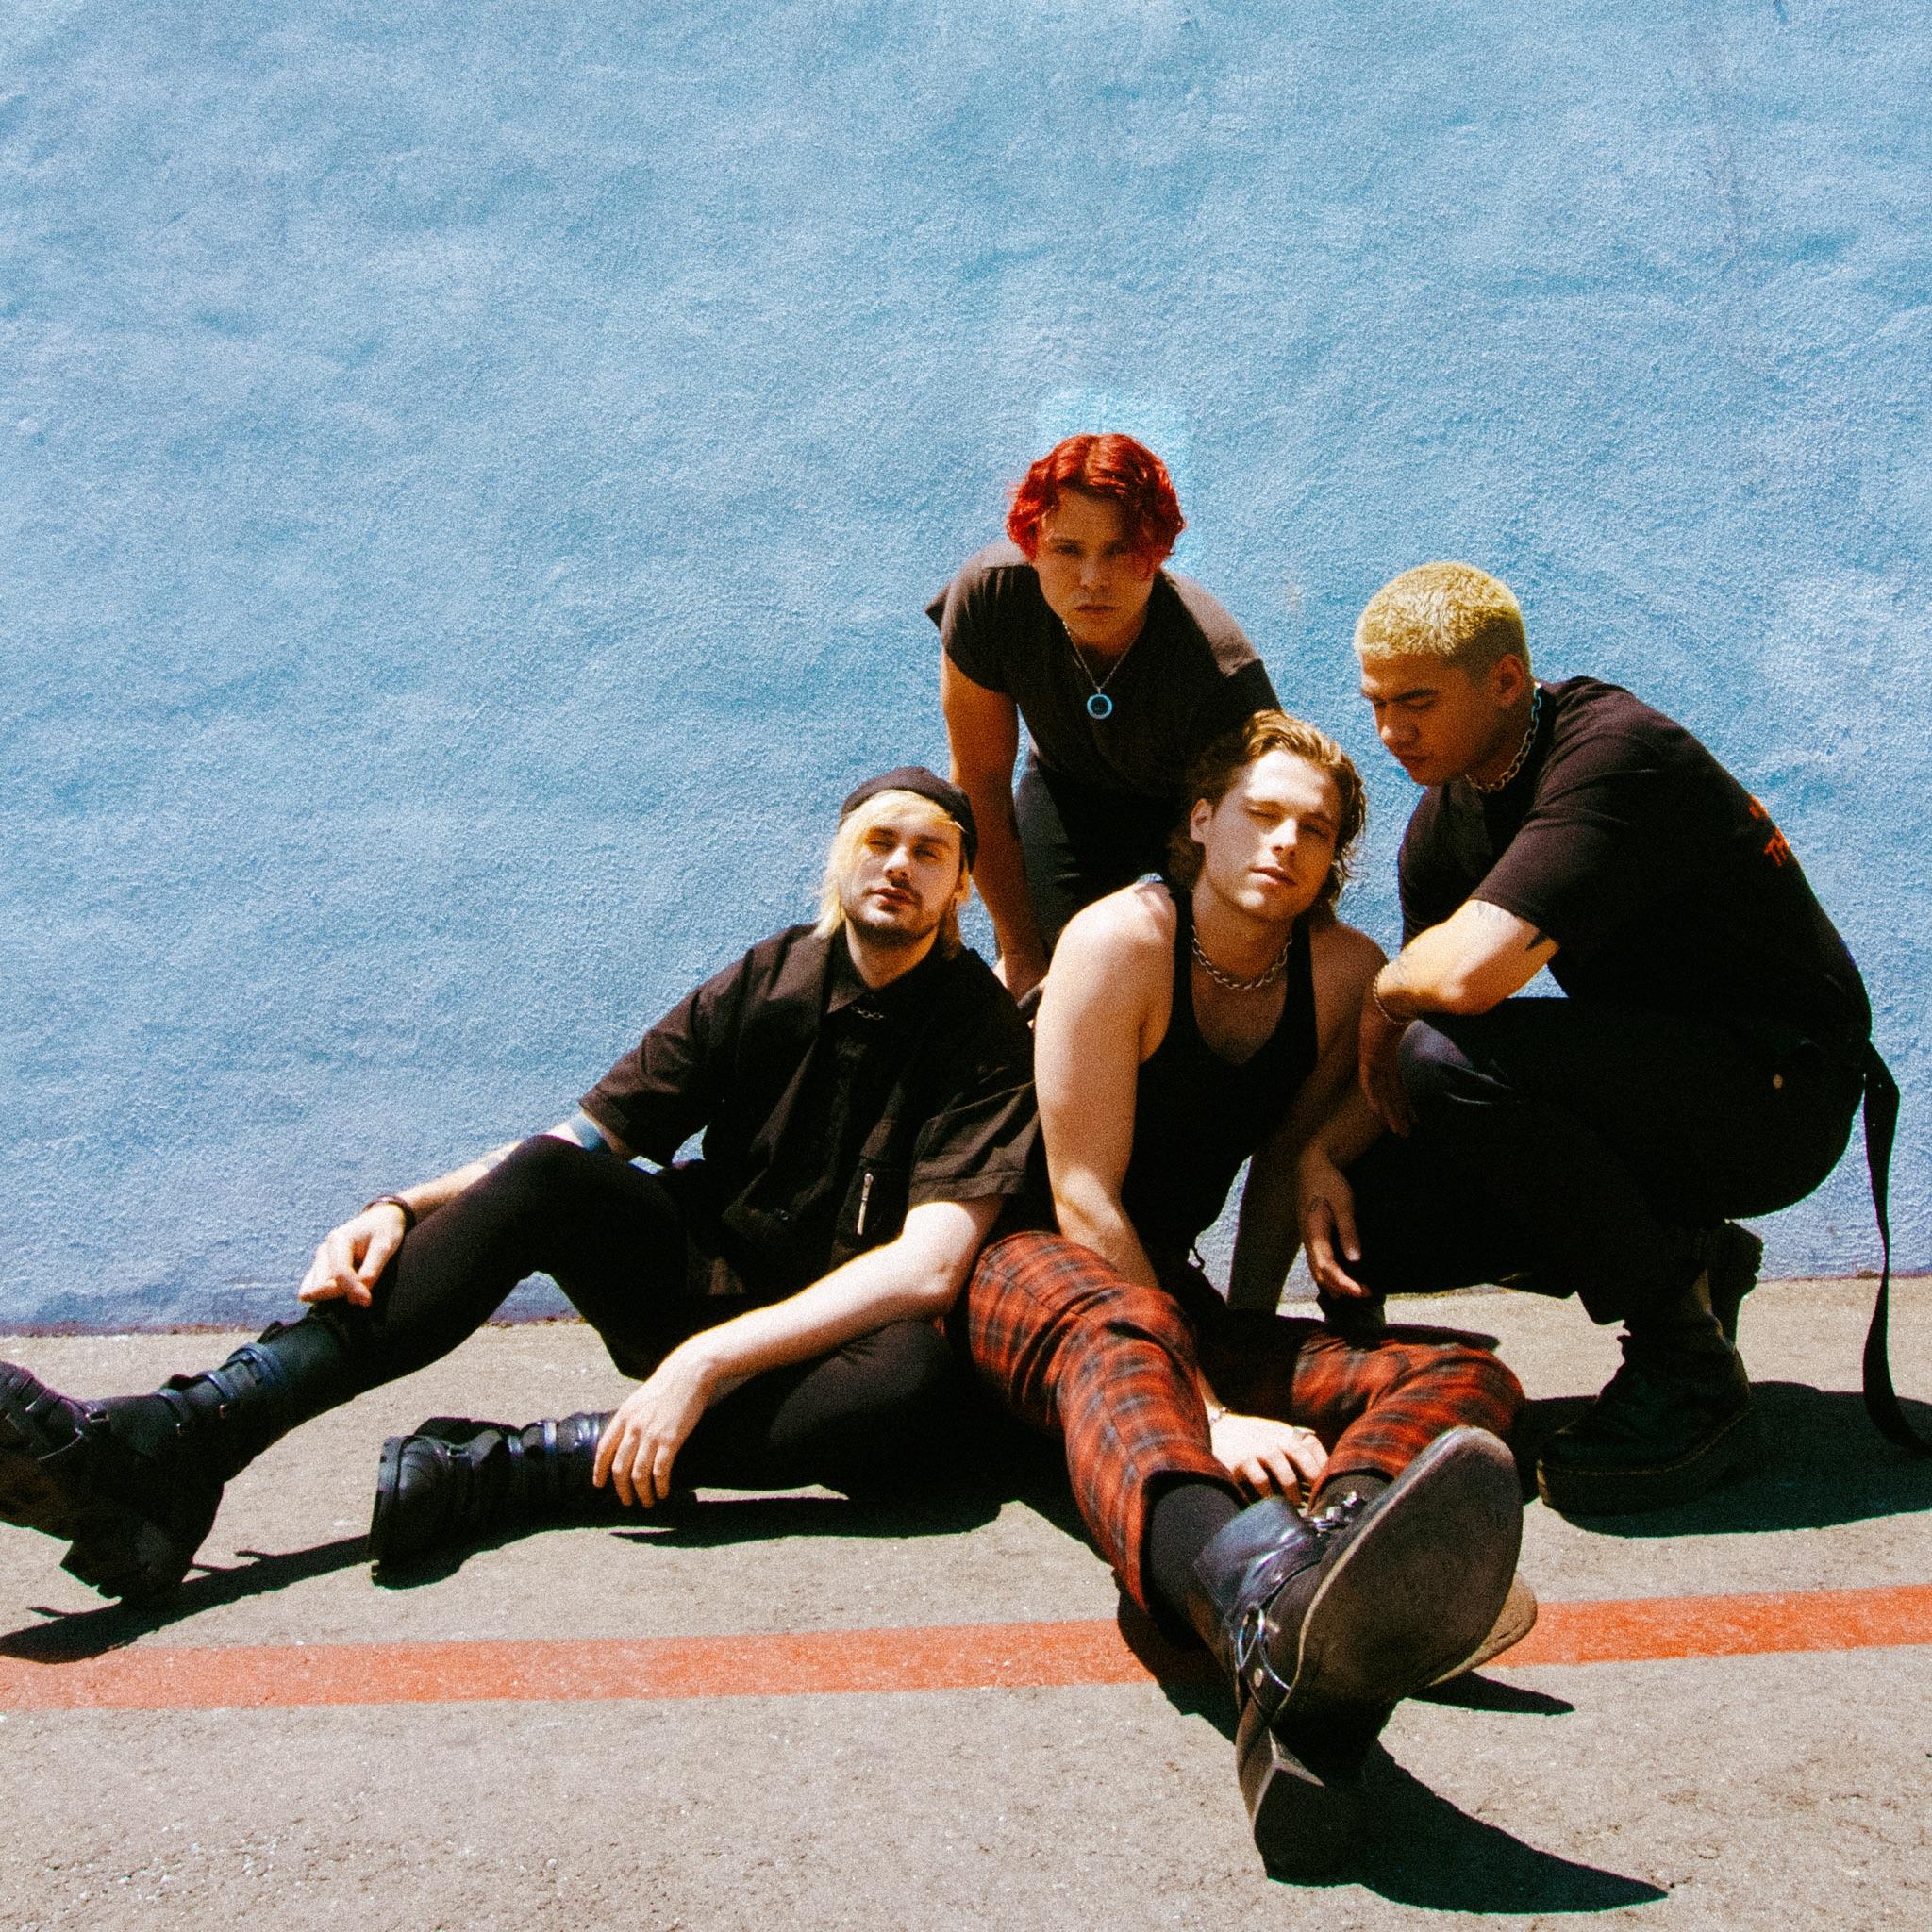 5 Seconds of Summer | EMI Music Publicity Portal